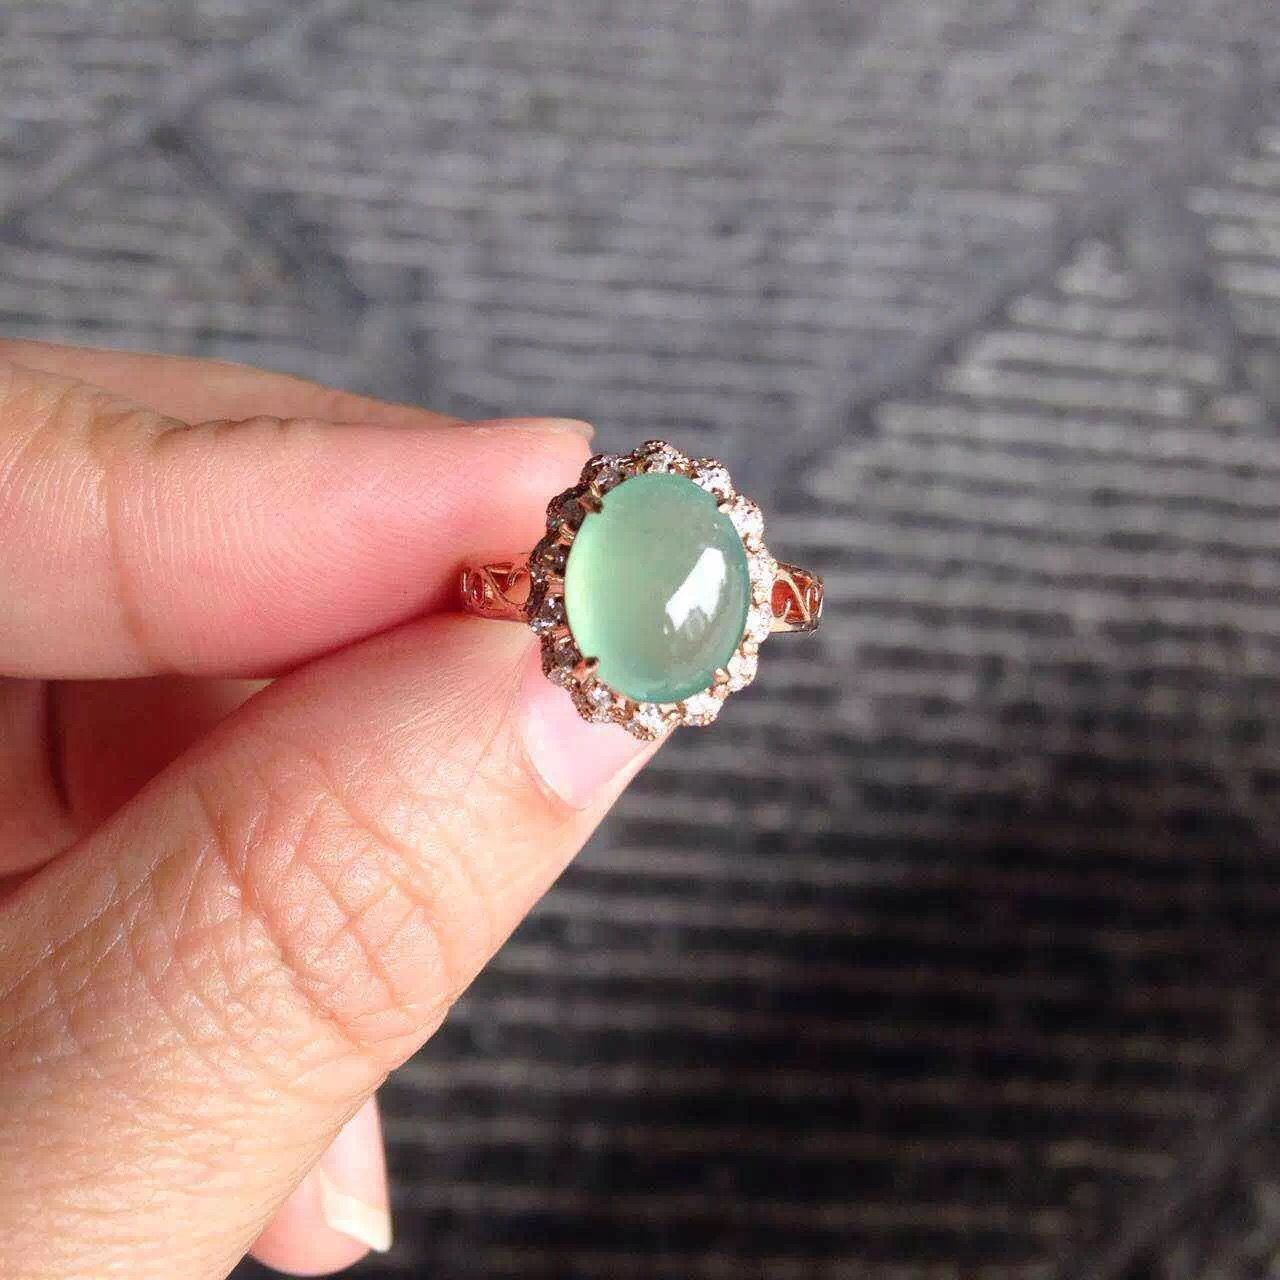 b9571bde54656 Perfect 18K rose gold icy light green jade filigree band engagement ...